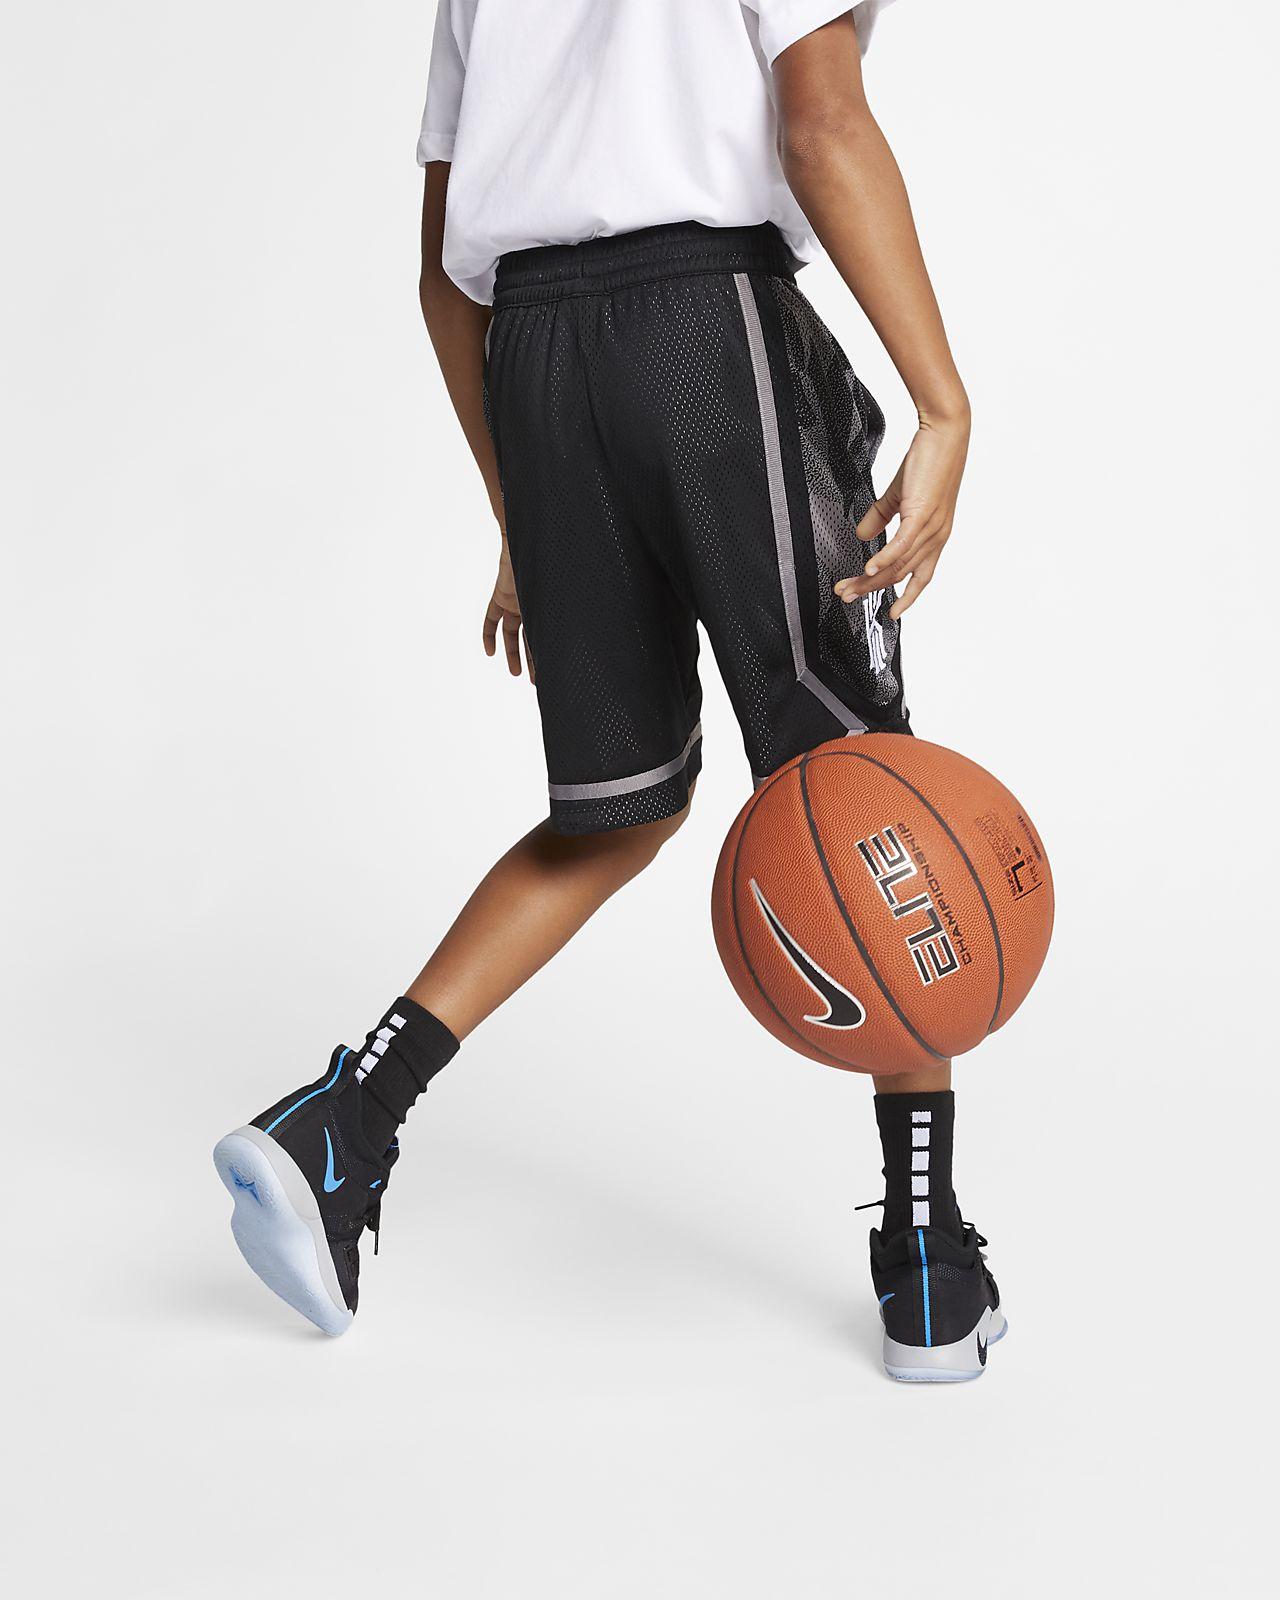 450c5bed3c Kyrie Big Kids' (Boys') Basketball Shorts